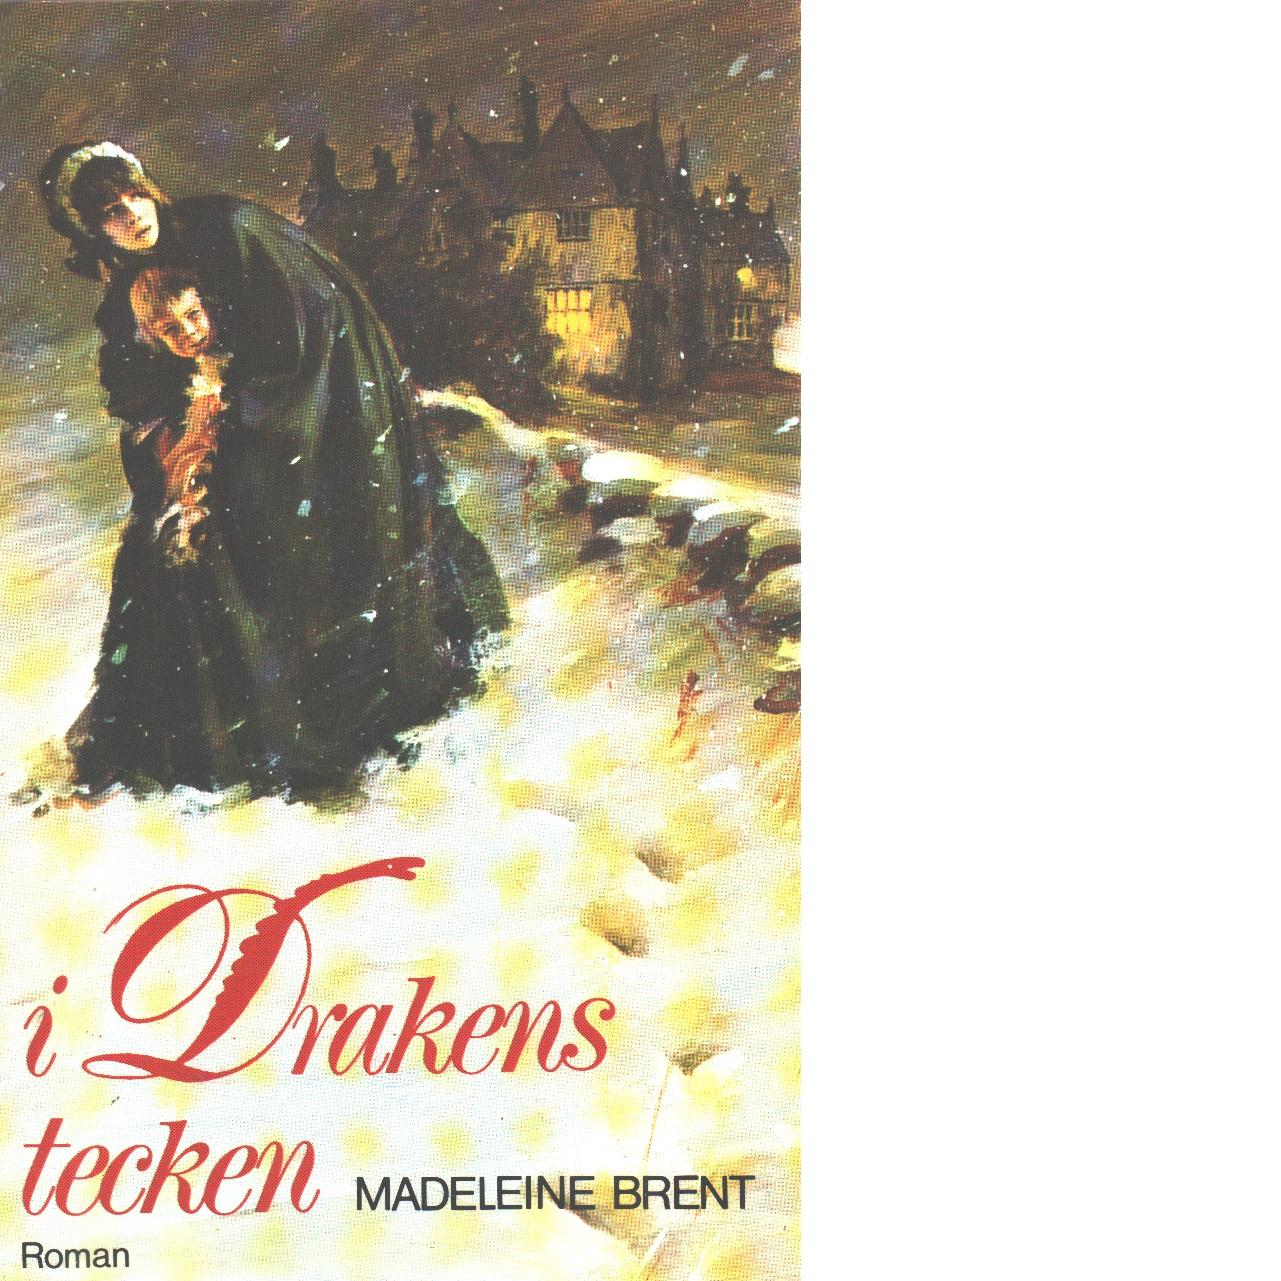 I Drakens tecken - Brent, Madeleine